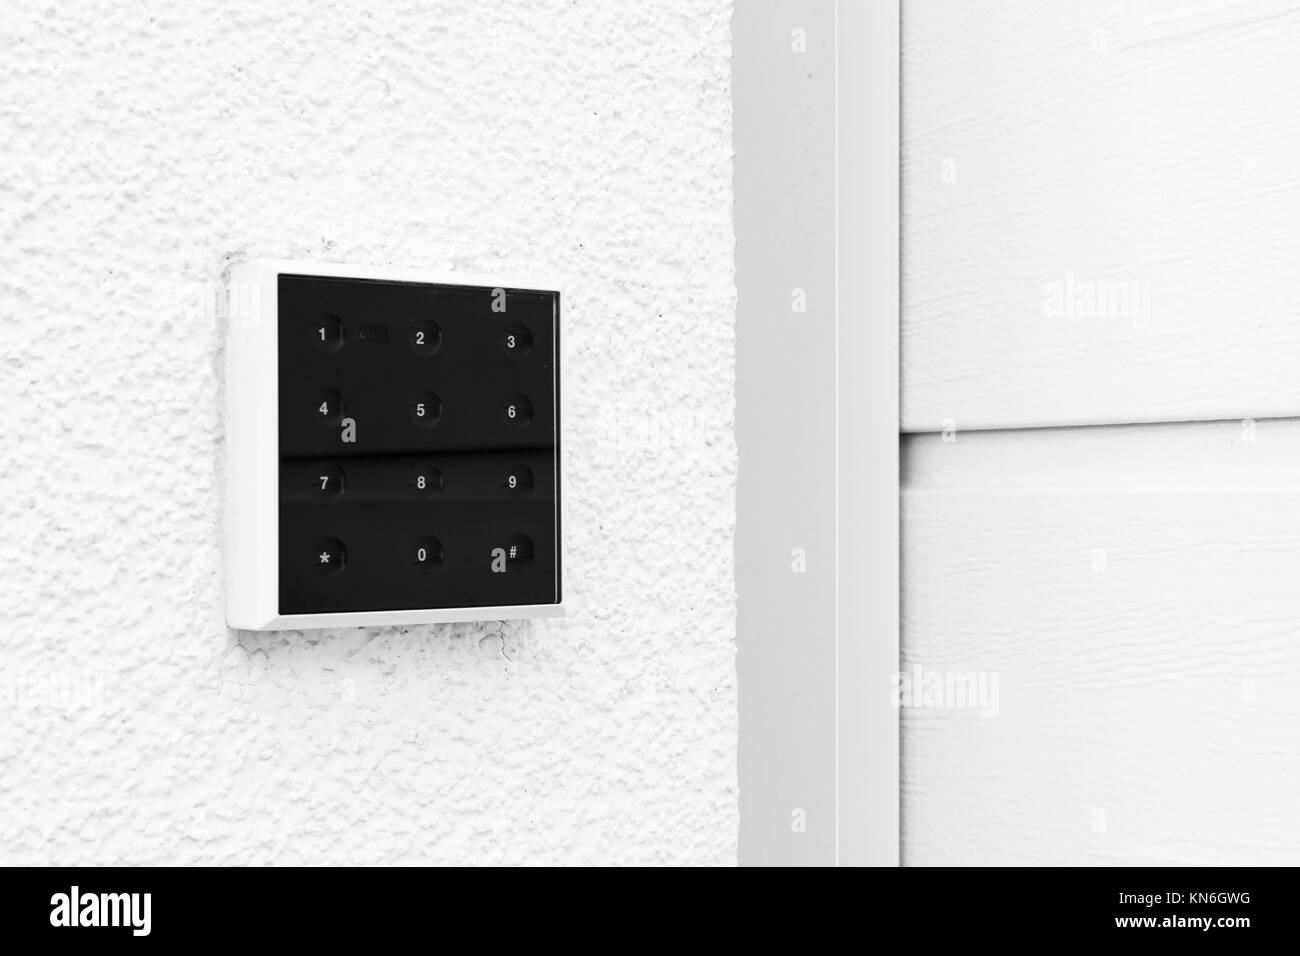 Black and White Modern Contemporary Keypad Design Garage Door - Stock Image